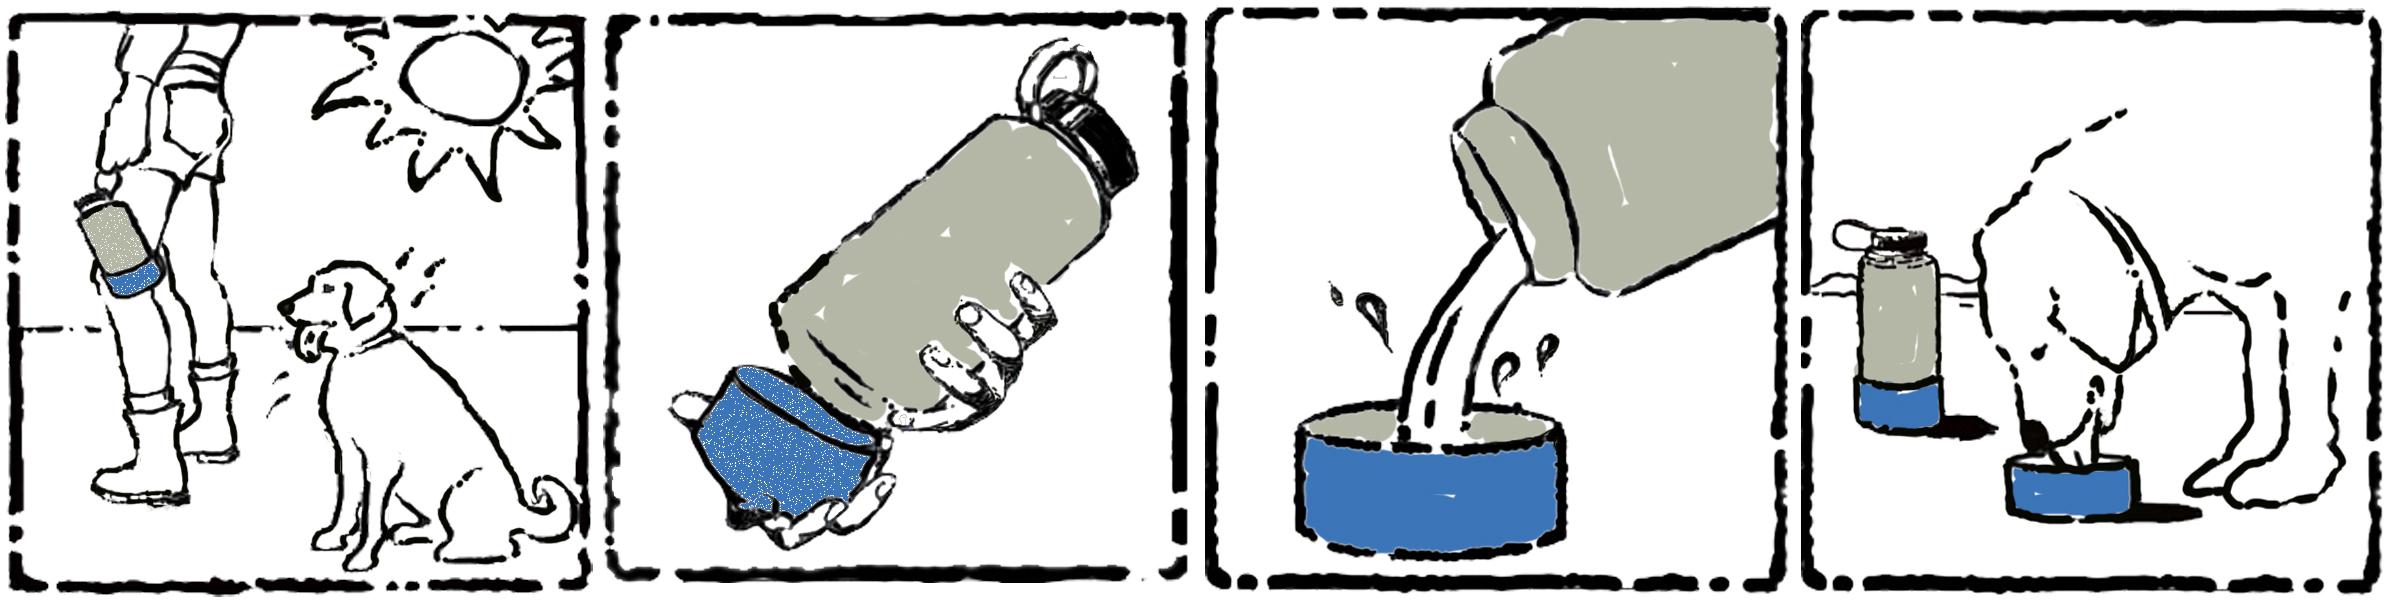 Cartoon-4-across copy.jpg